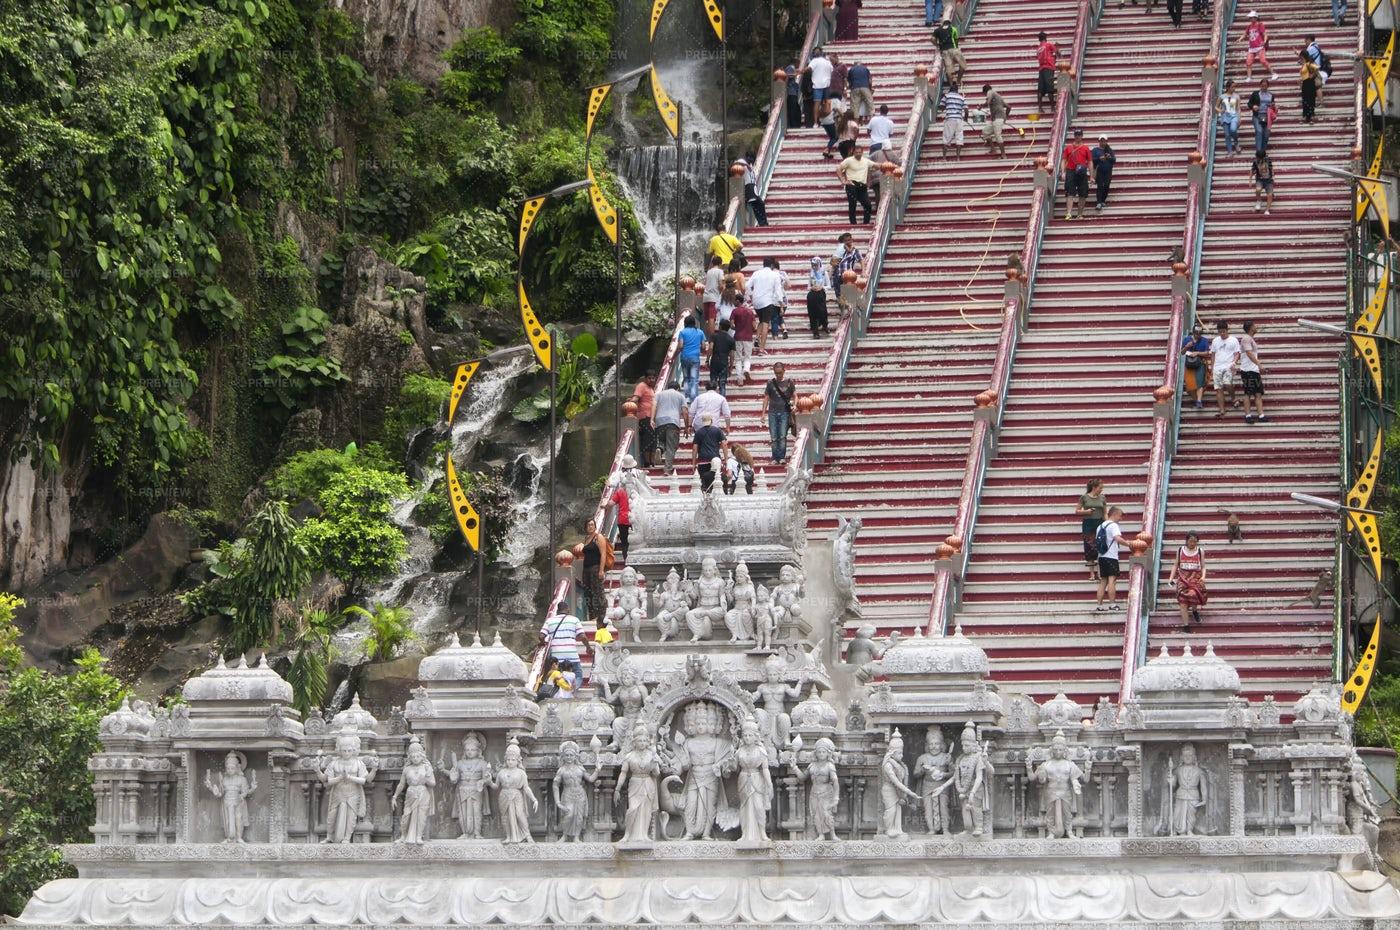 People Climbing Batu Caves Stairs: Stock Photos